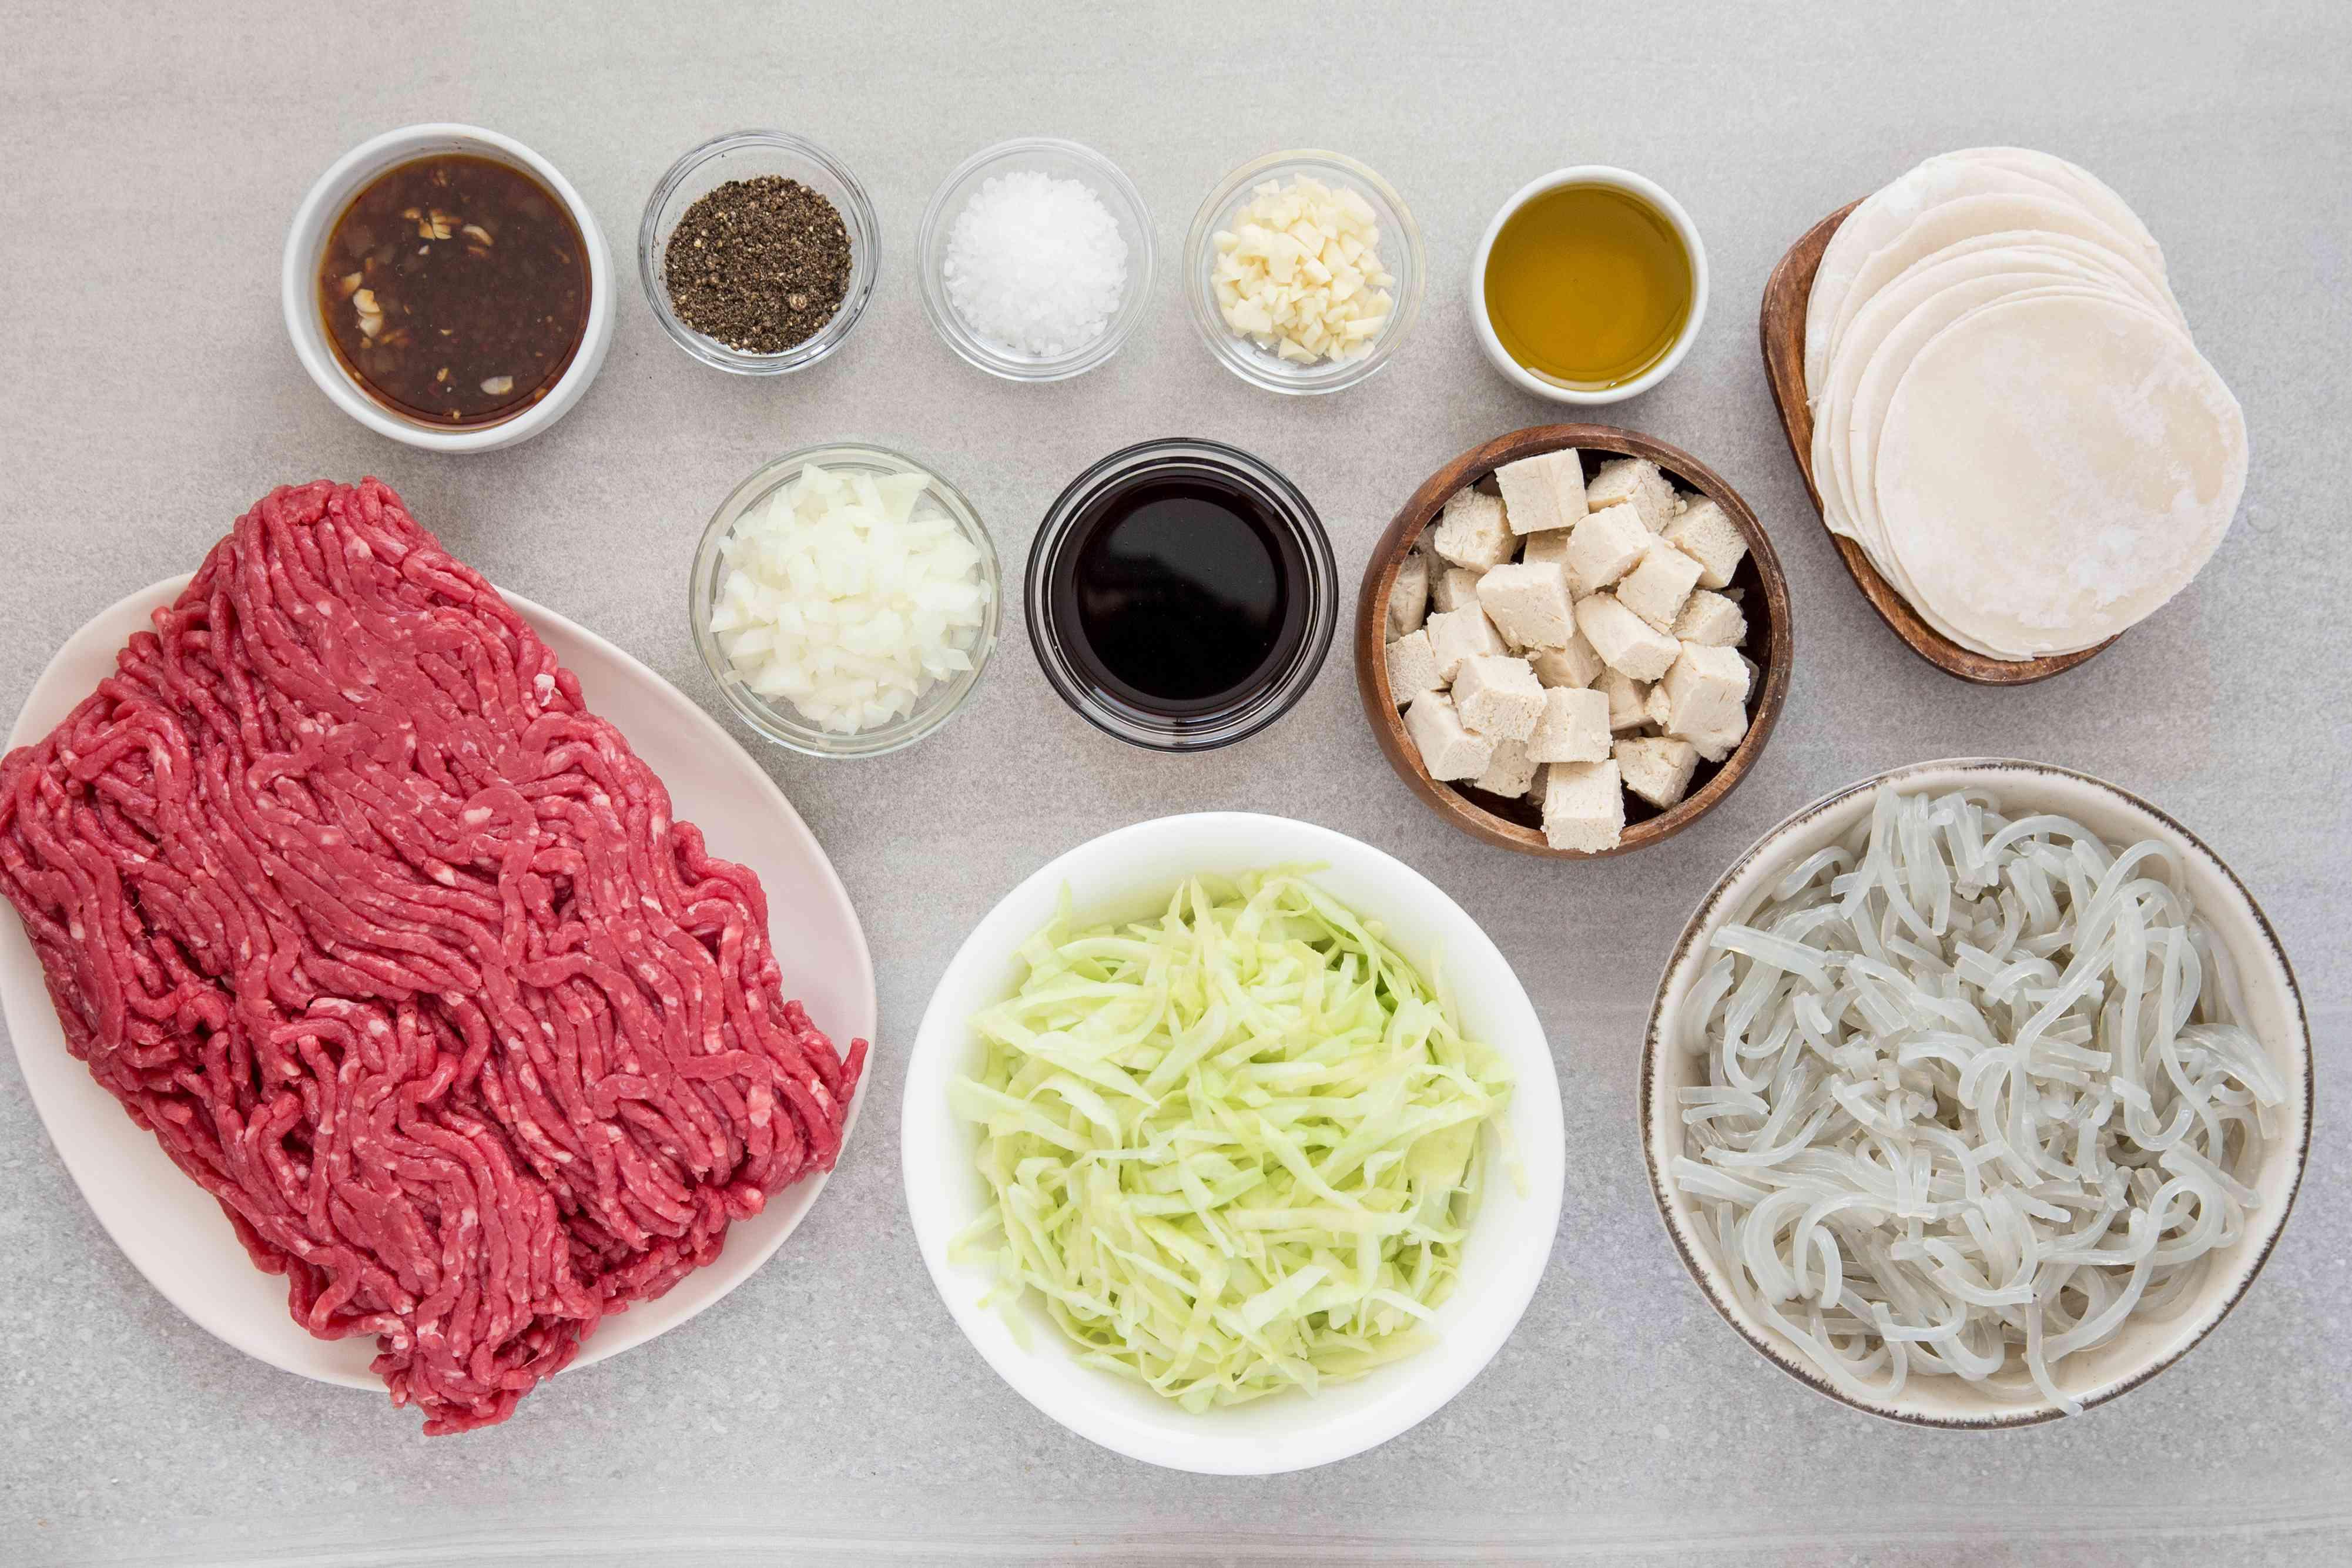 Ingredients for Korean dumpling mandoo